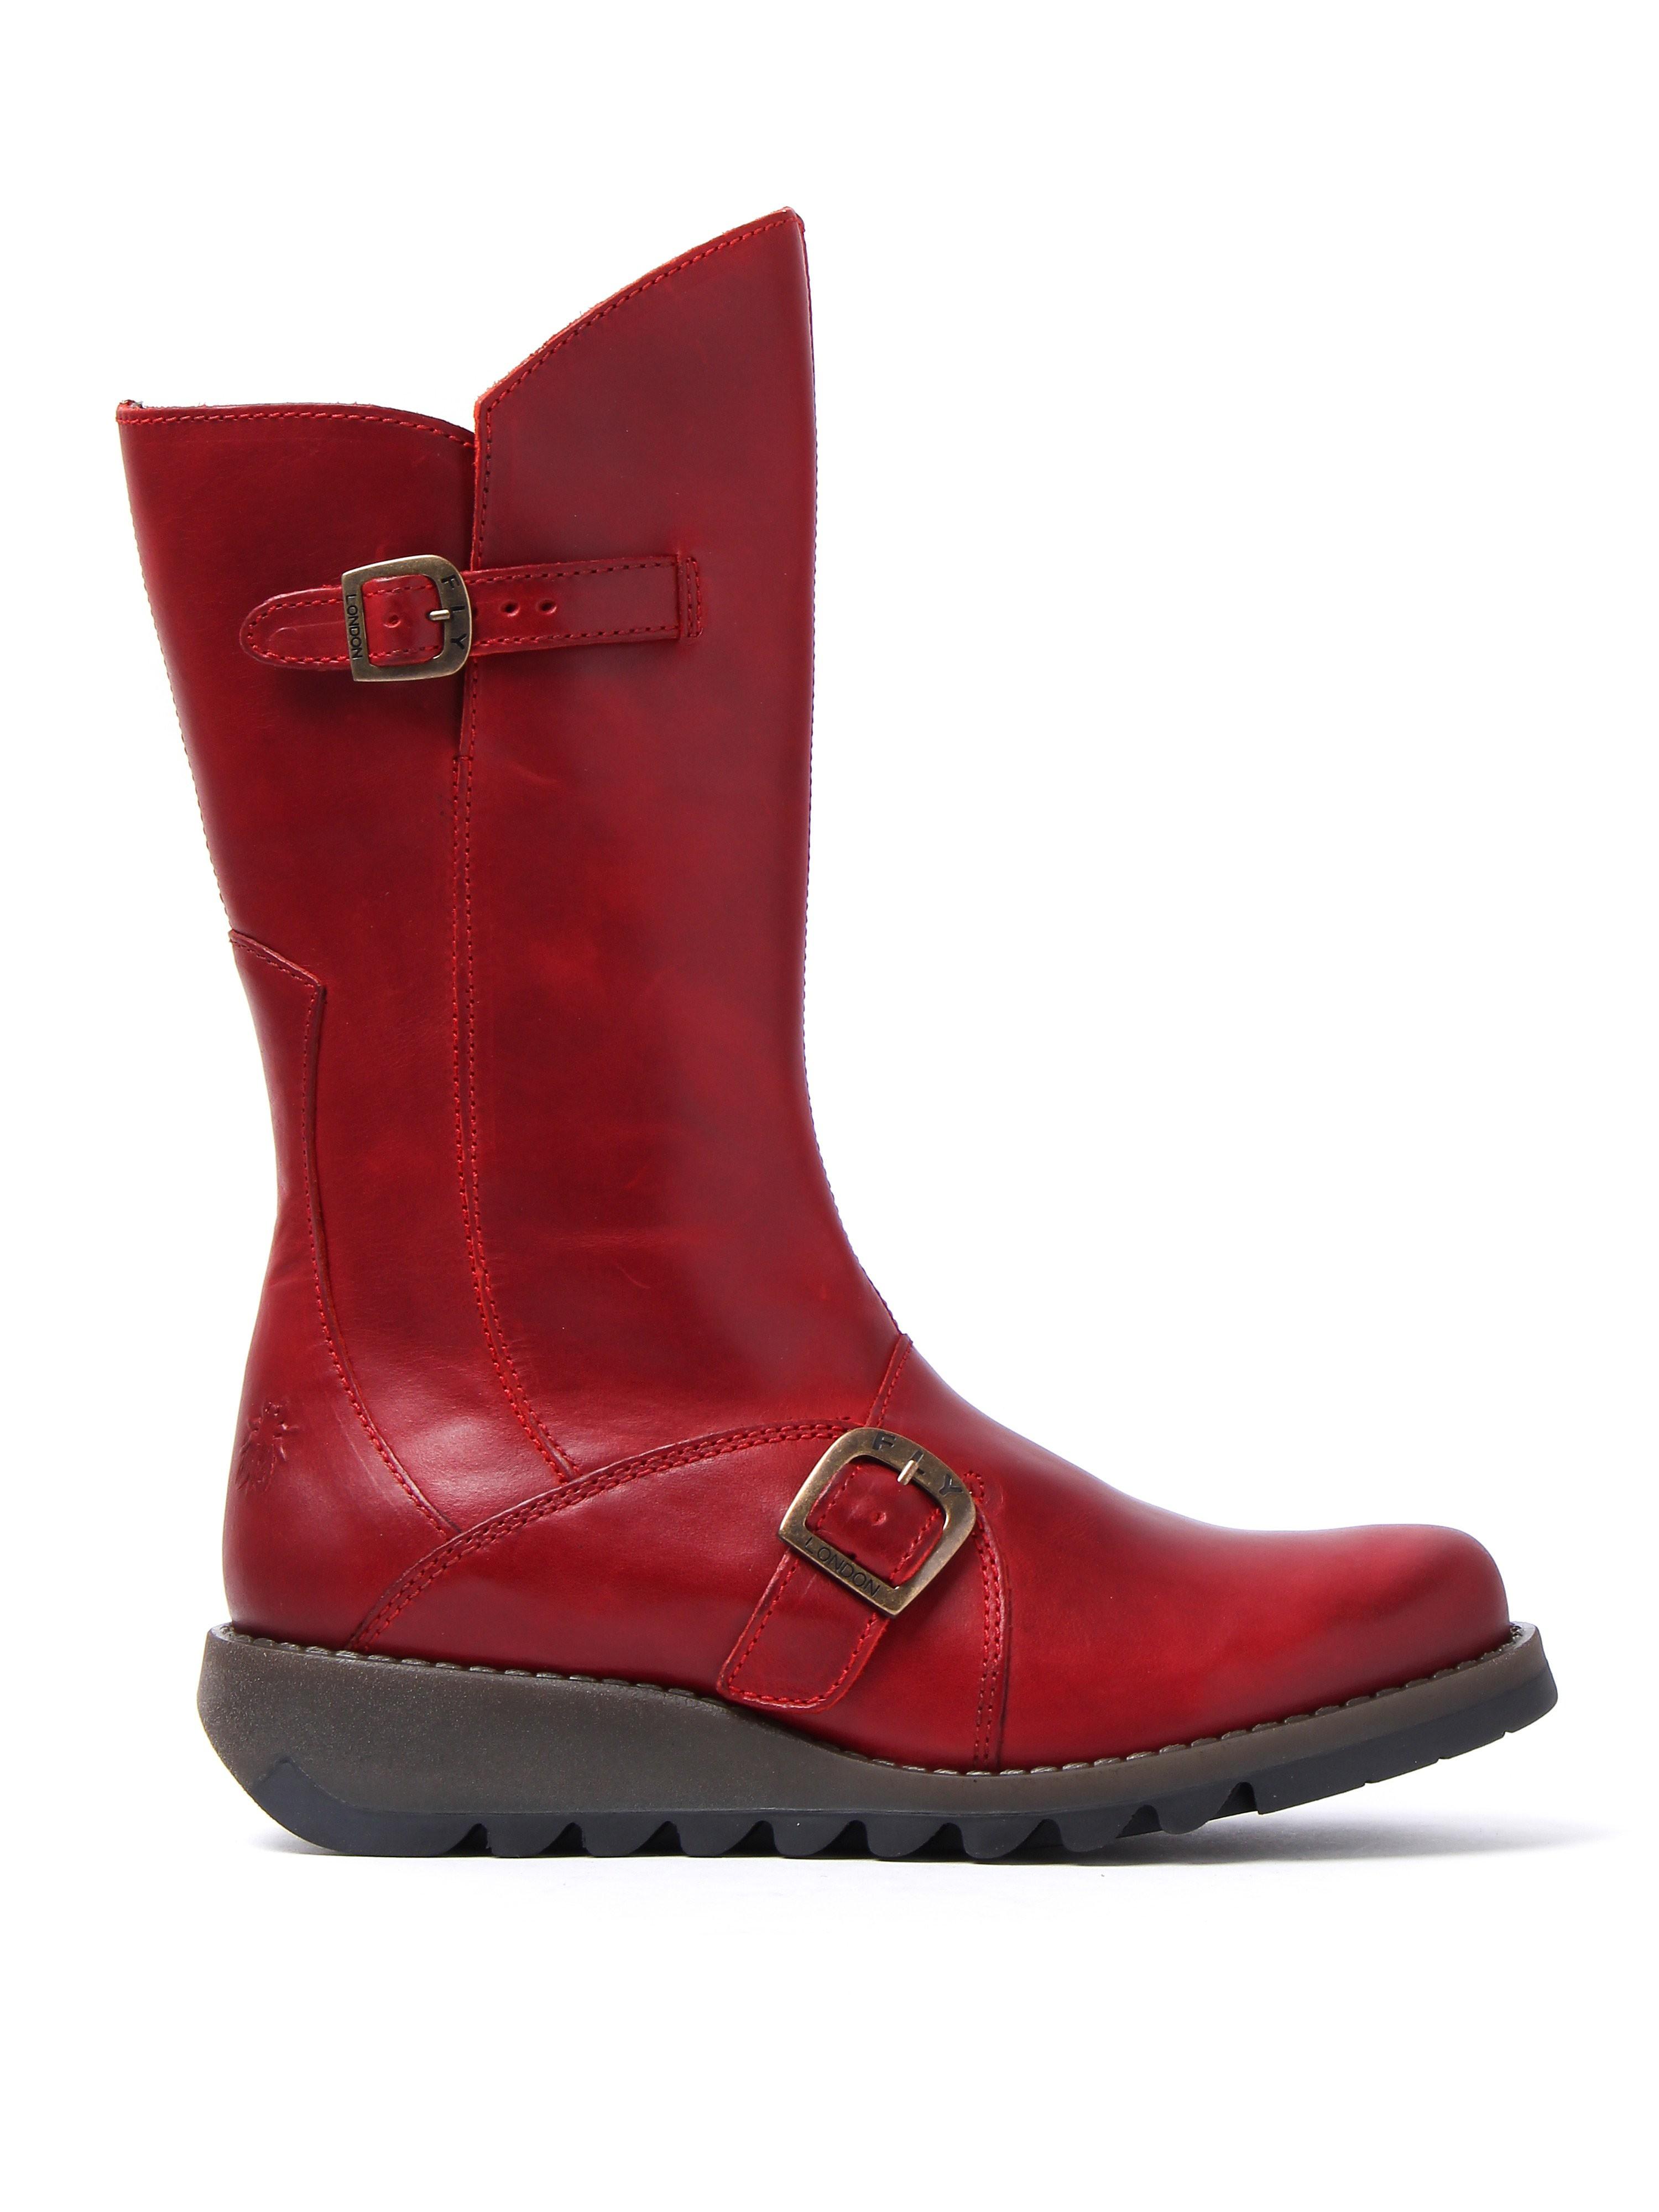 Fly London Women's Mes 2 Biker Boots - Red